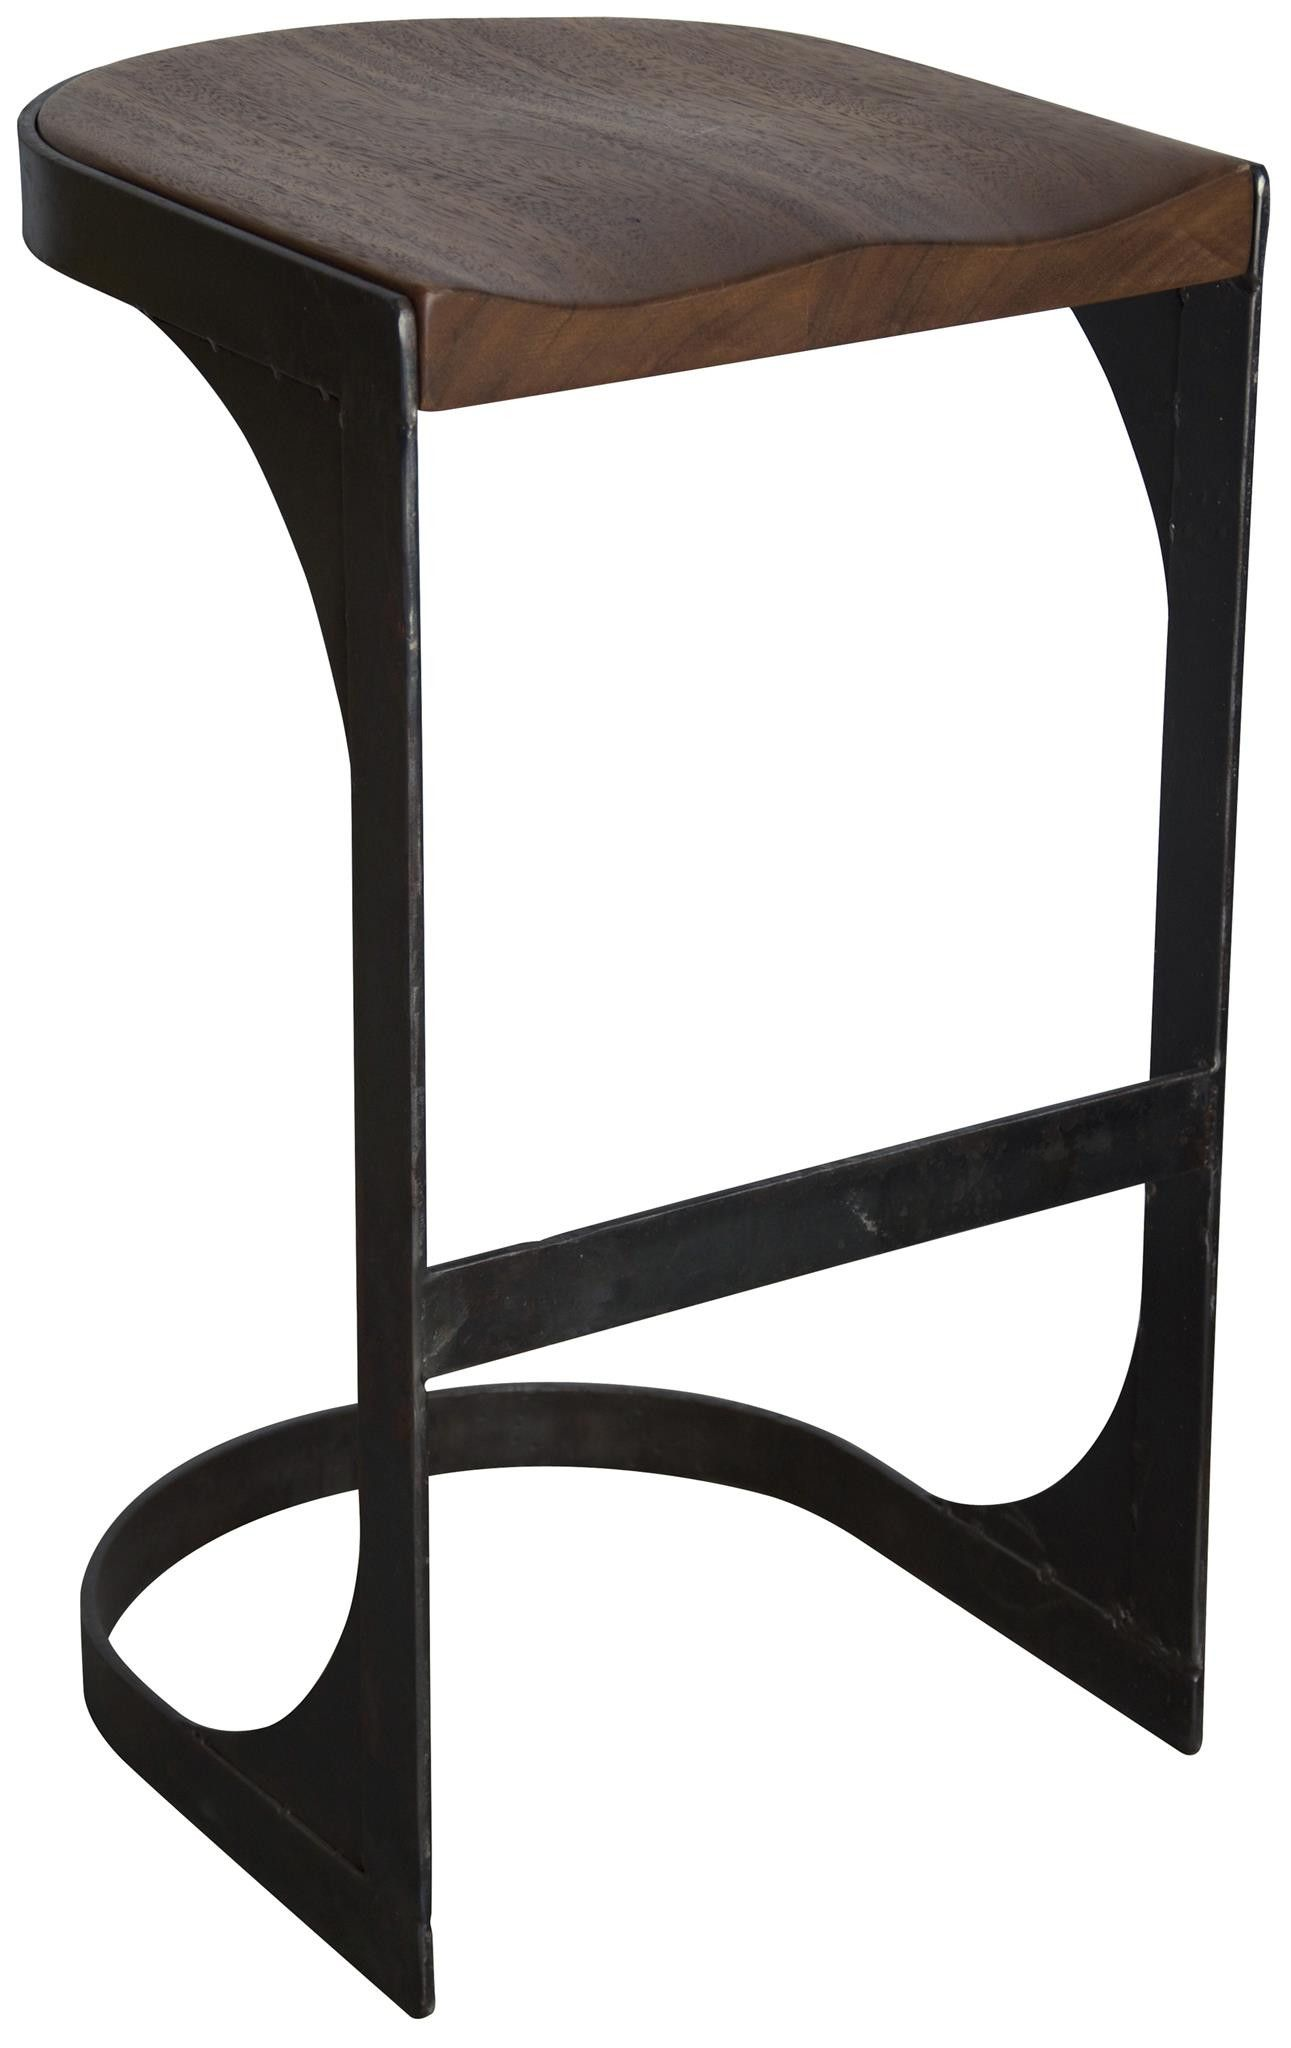 Stanley Bar Stool Bar Furniture Wood And Metal Furniture